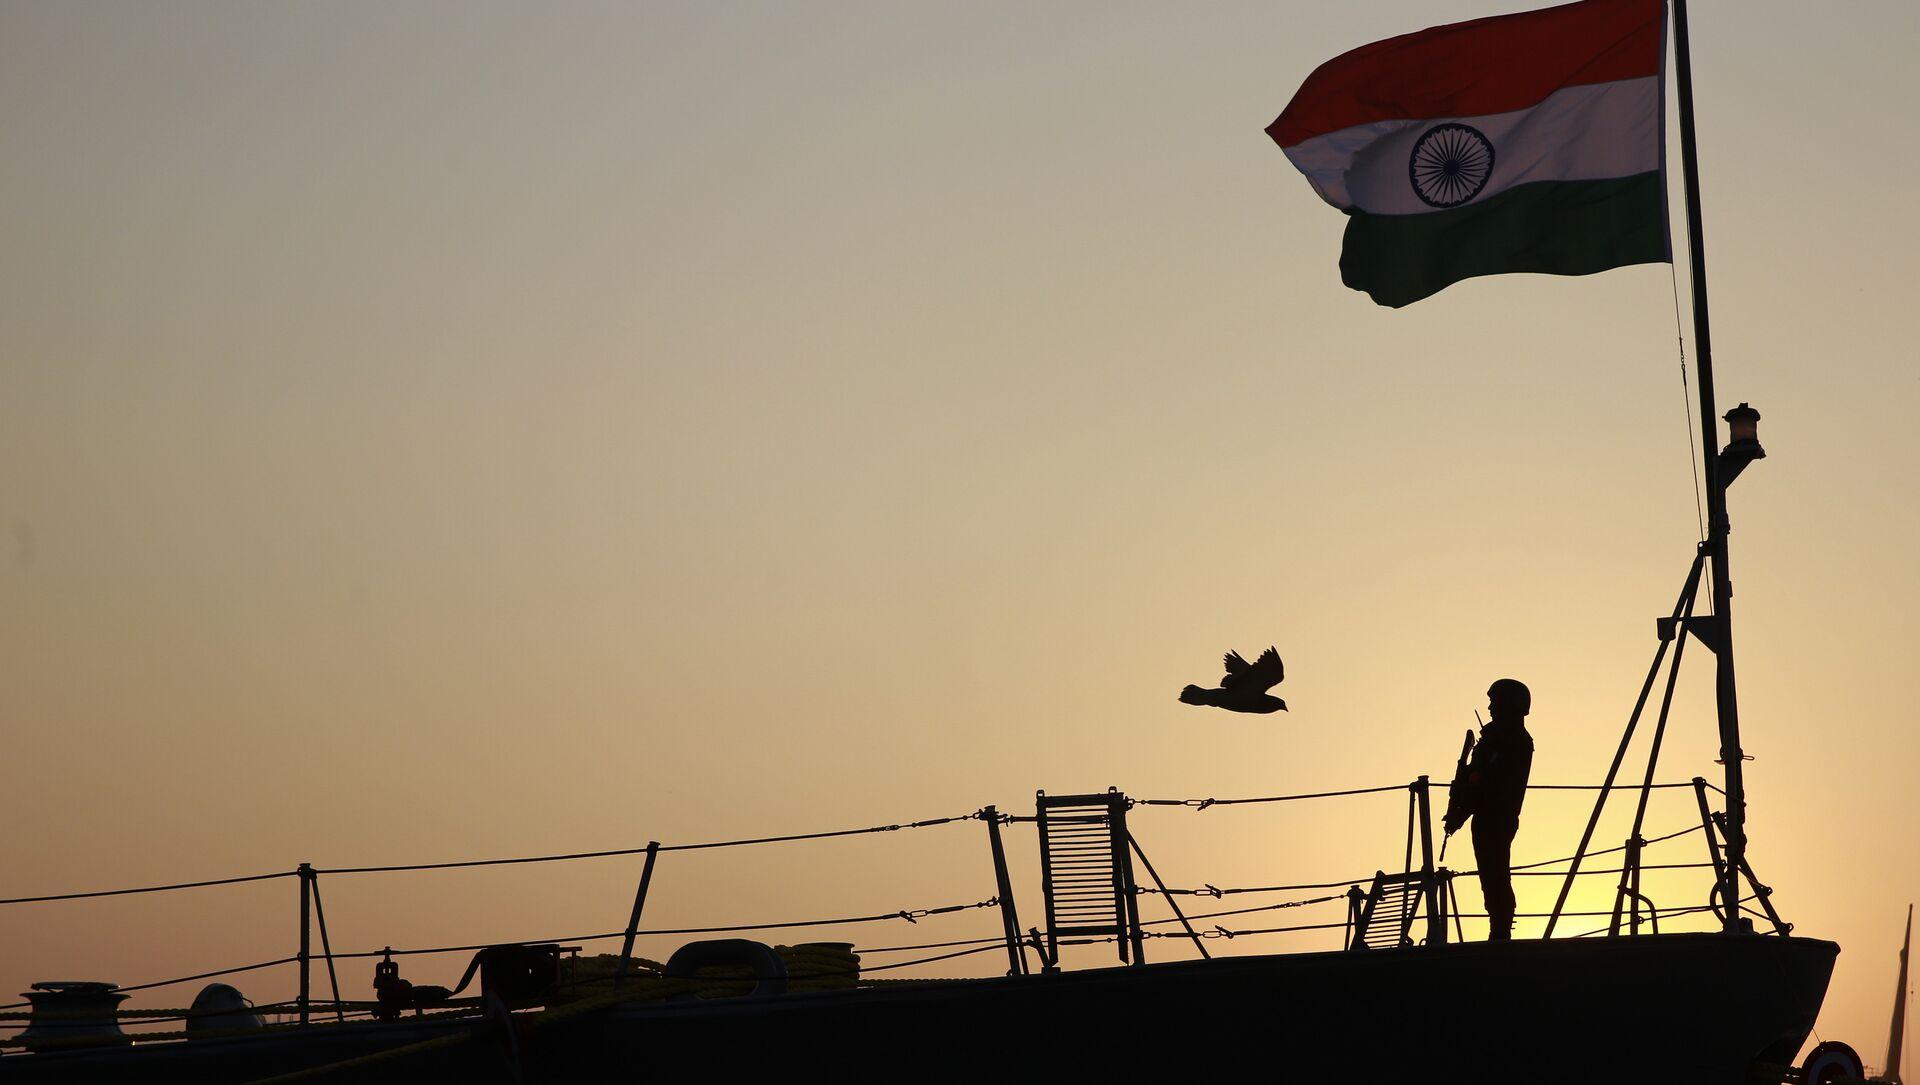 Indian serviceman stands guard on board tu warship Godavari during its decommissioning at the naval dockyard in Mumbai, India, 23 December 2015 - Sputnik International, 1920, 27.07.2021